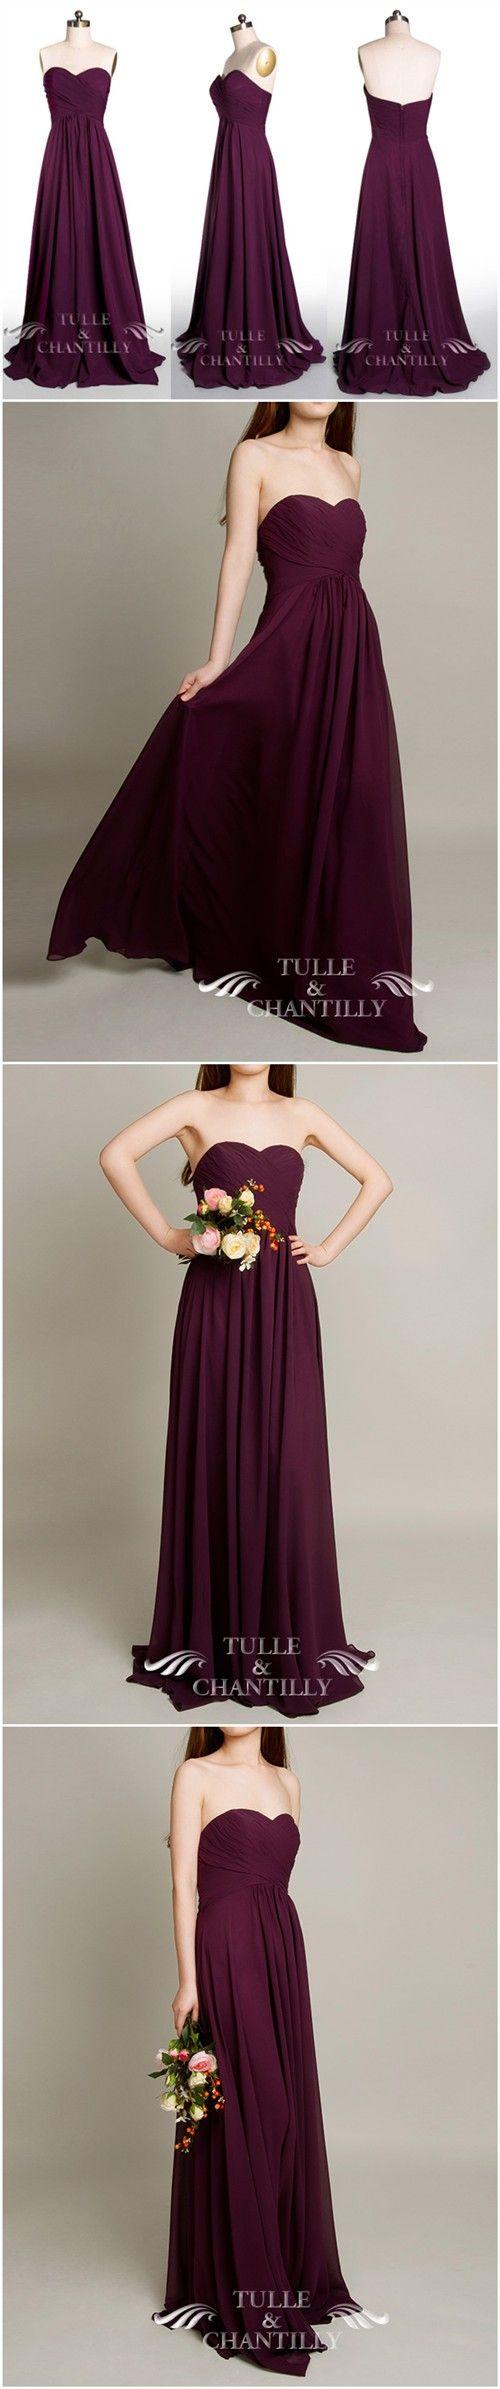 Best 25 Bridesmaid Gowns Ideas On Pinterest